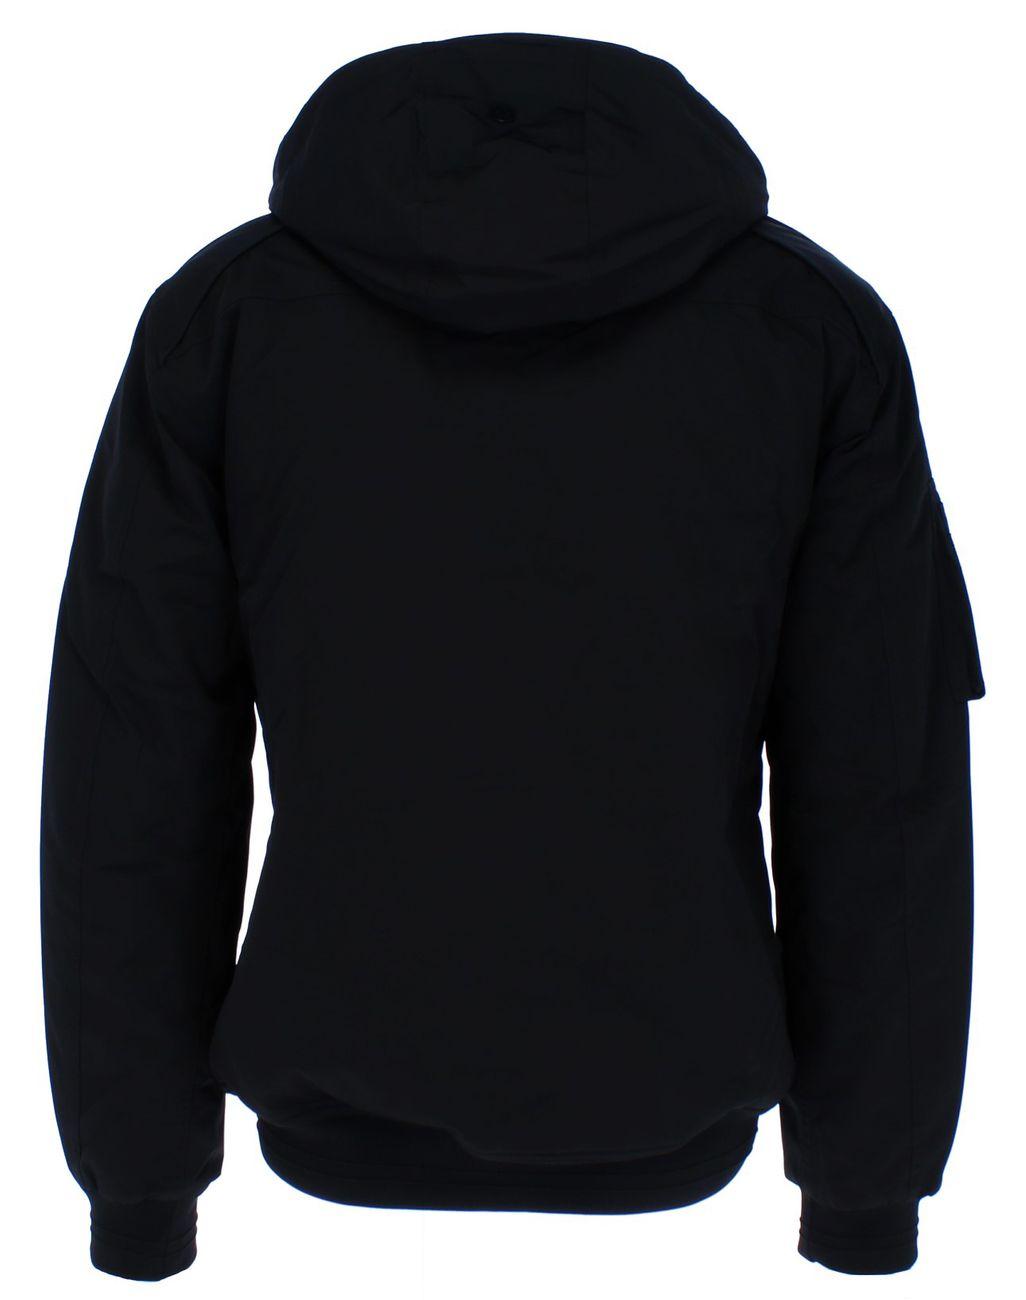 Details about Wellensteyn Cicero Winter CICW 870 Men's Winter Jacket